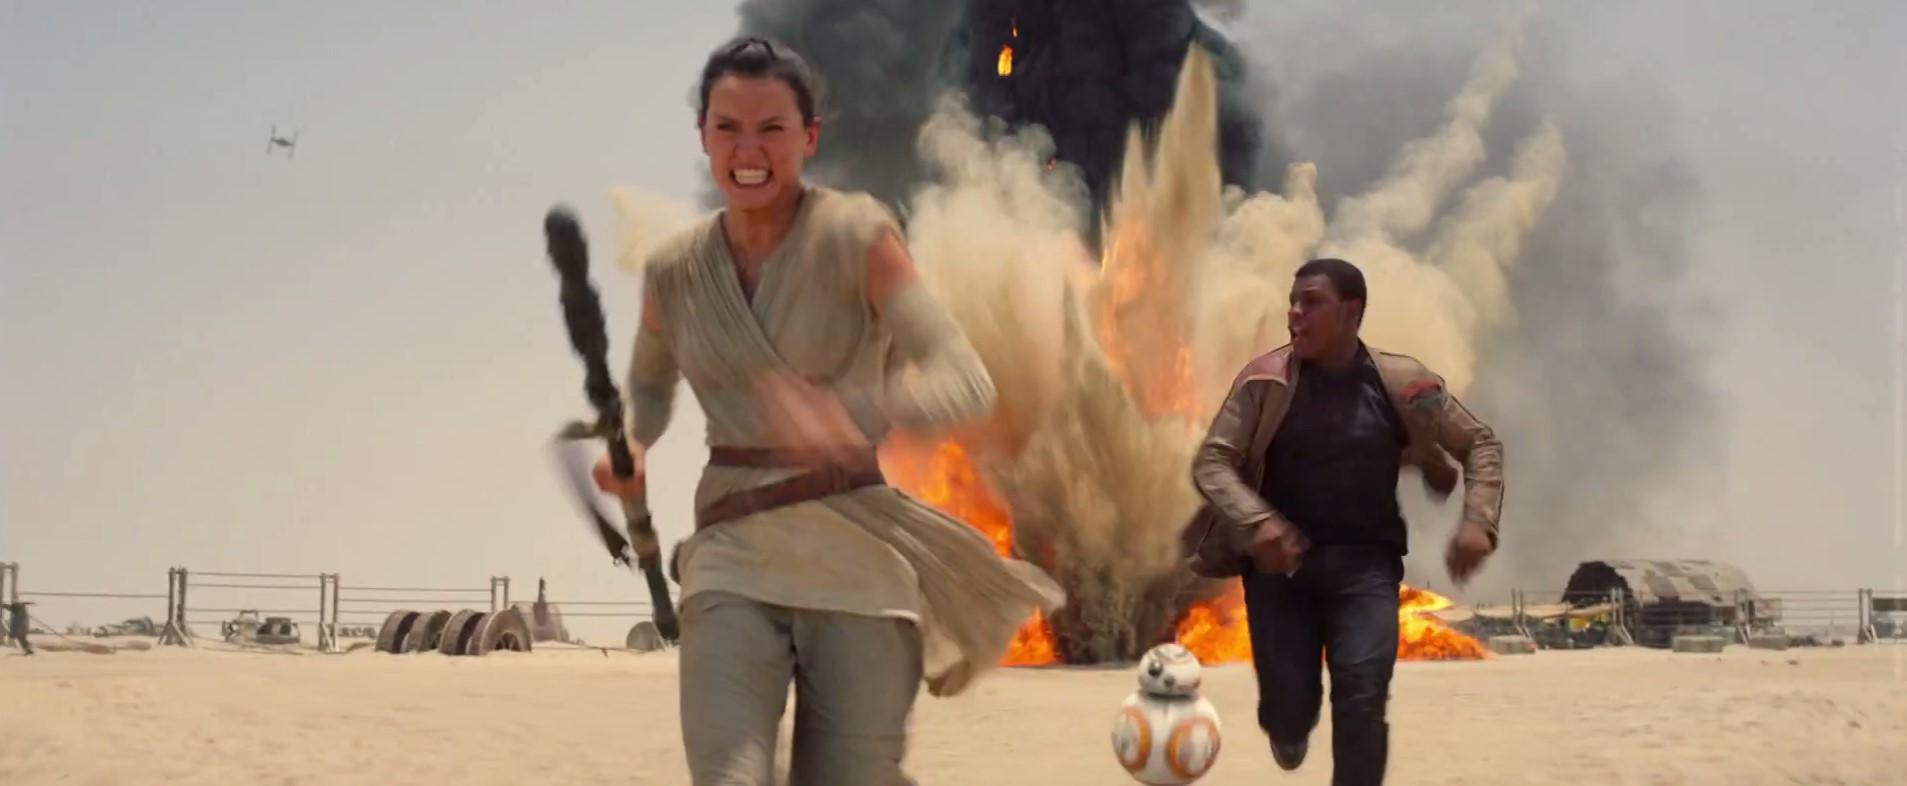 Rey and Finn